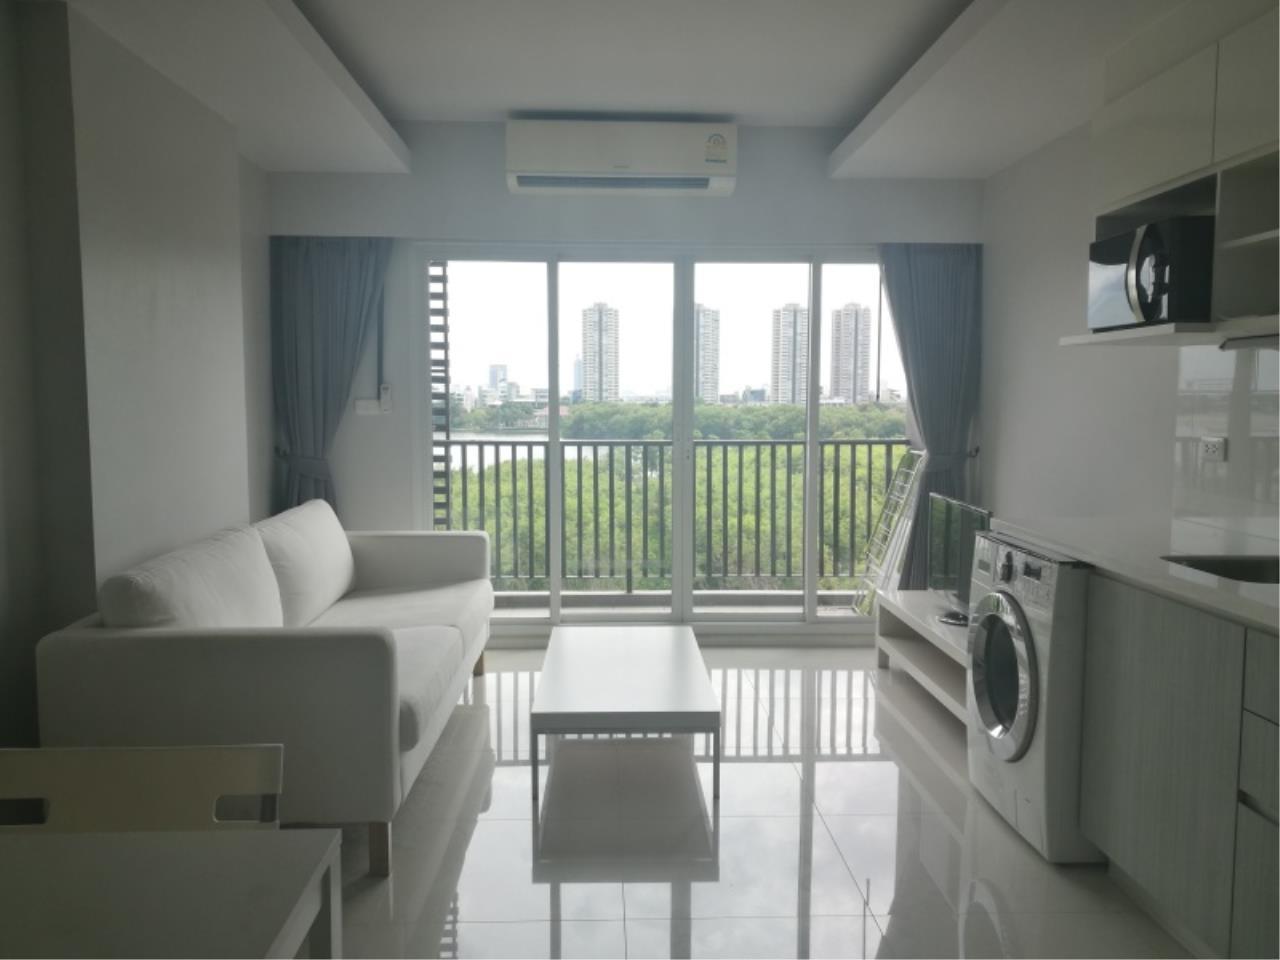 Century21 Skylux Agency's Double Lake Muang Thong Thani / Condo For Rent / 2 Bedroom / 57 SQM / Mueng Thong Thani / Bangkok 1